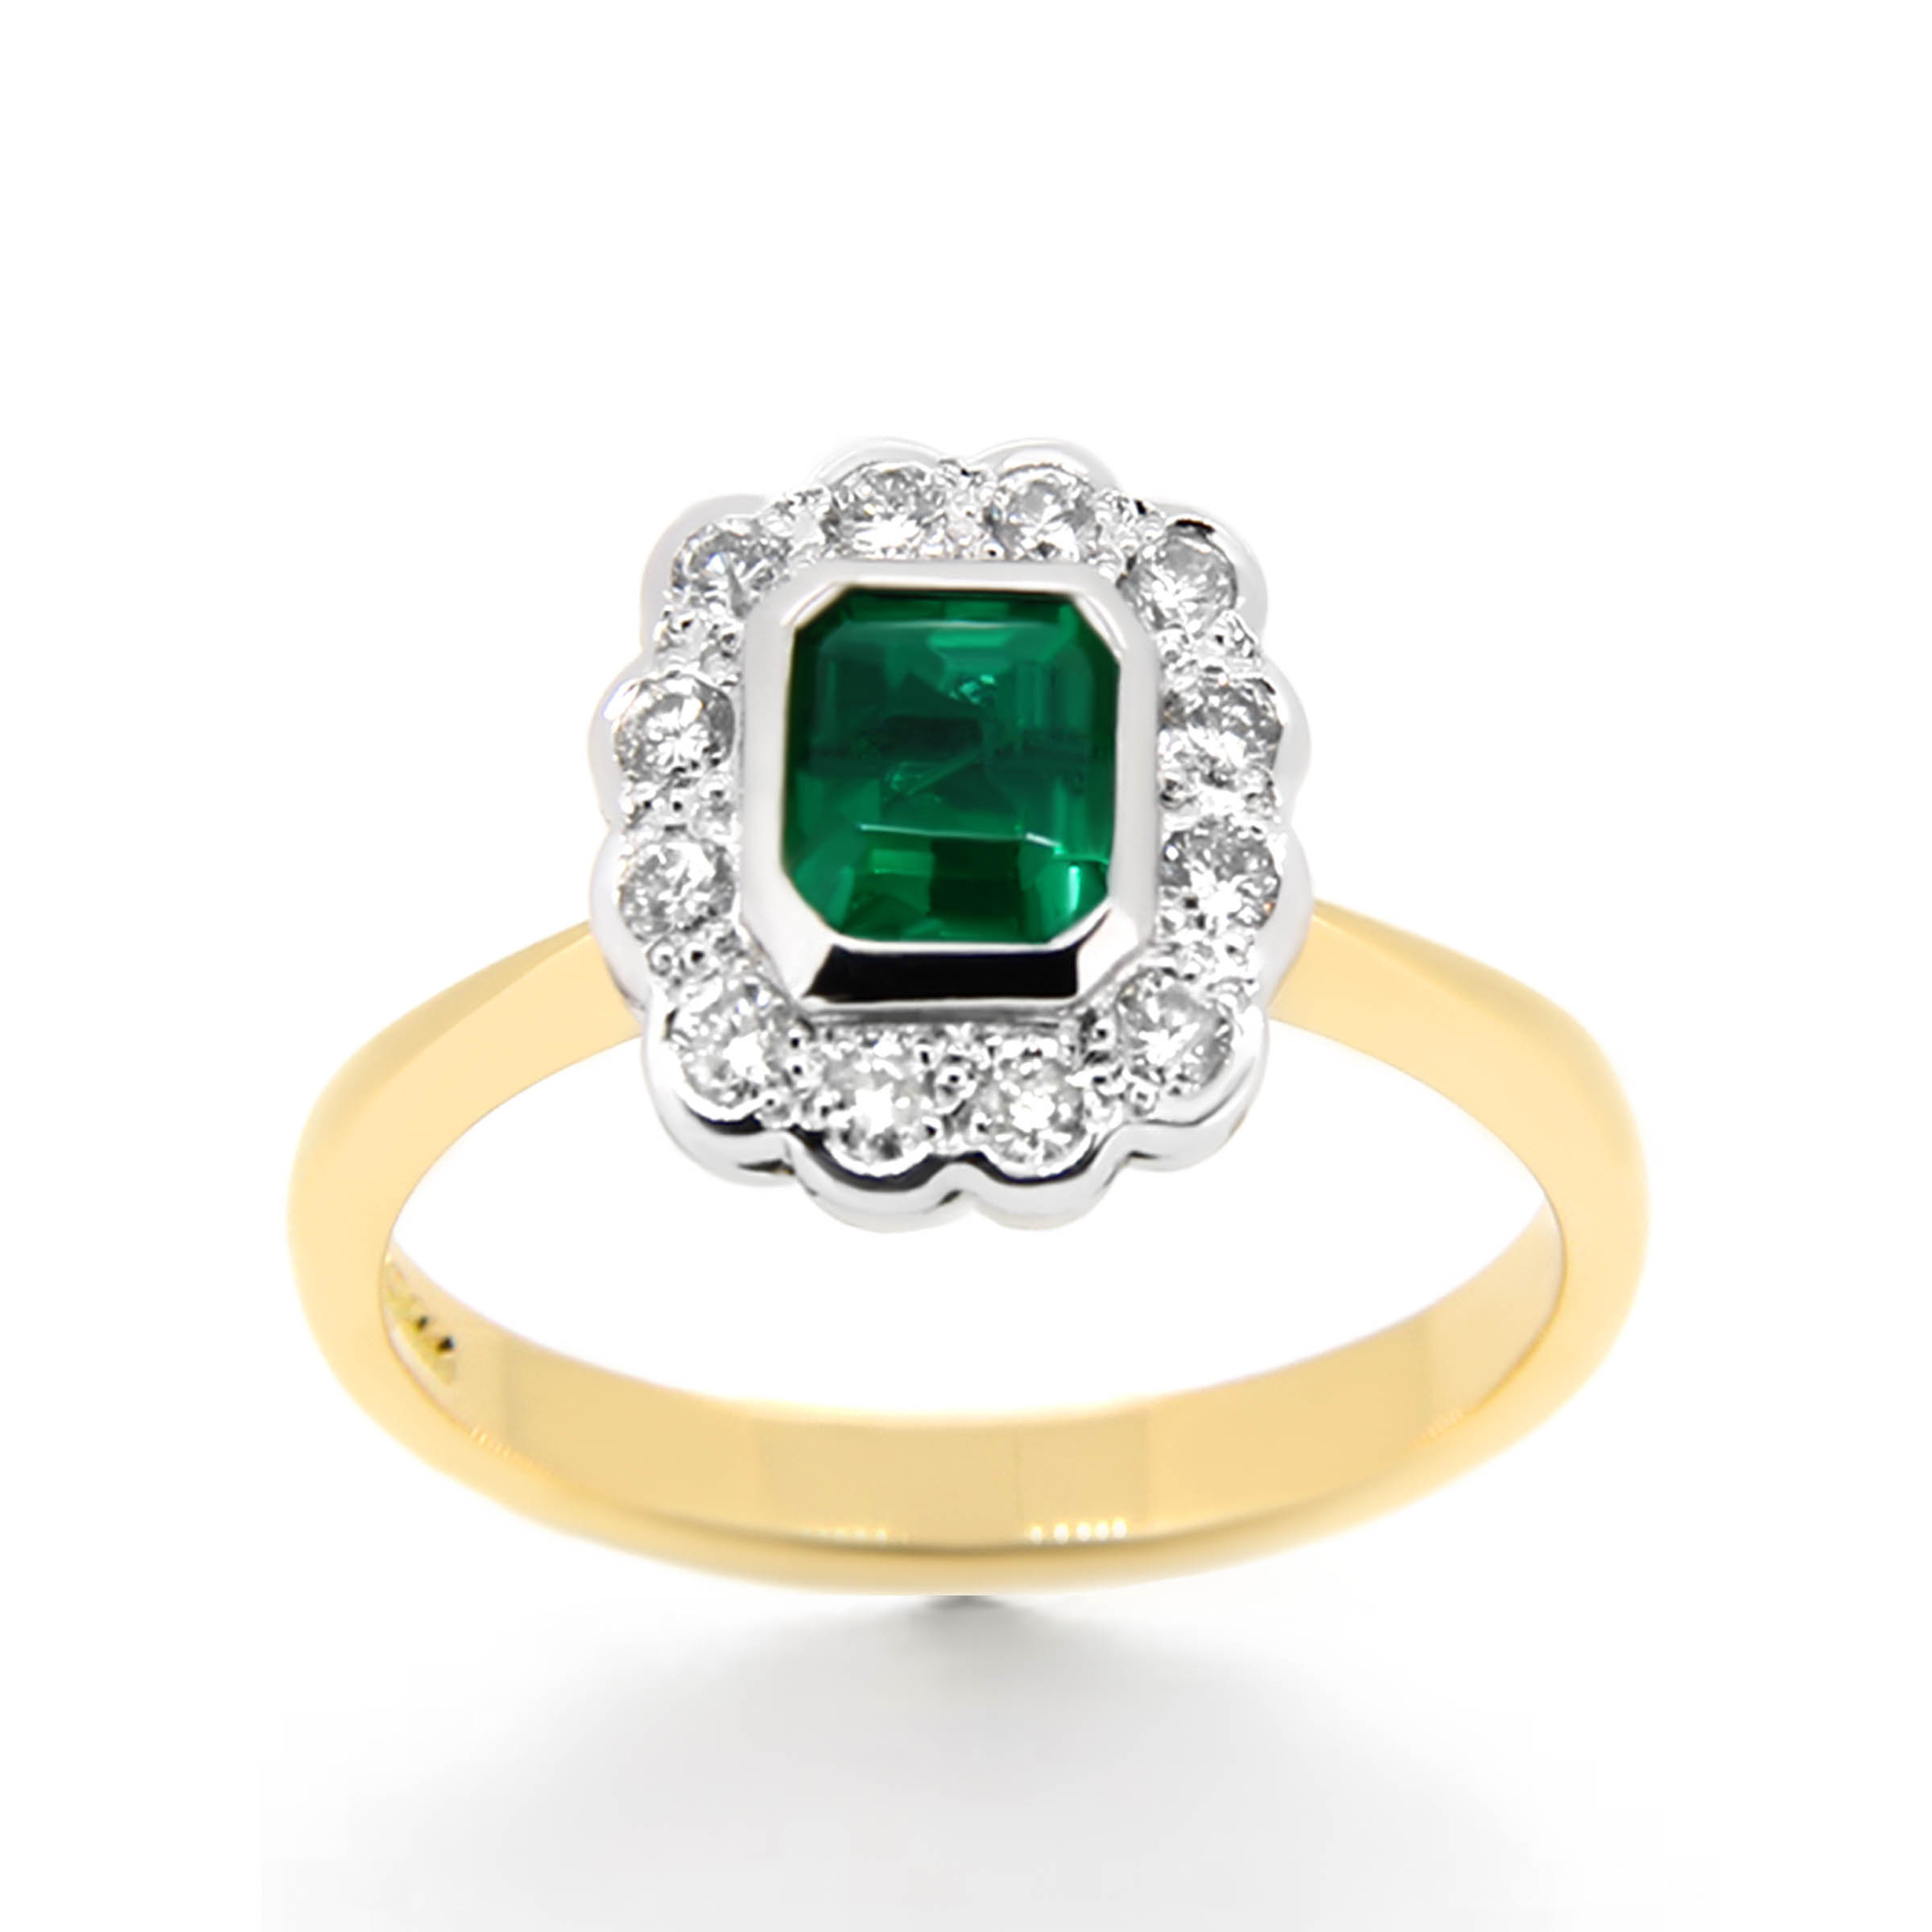 green emerald and diamond flower ring- haywards of hong kong